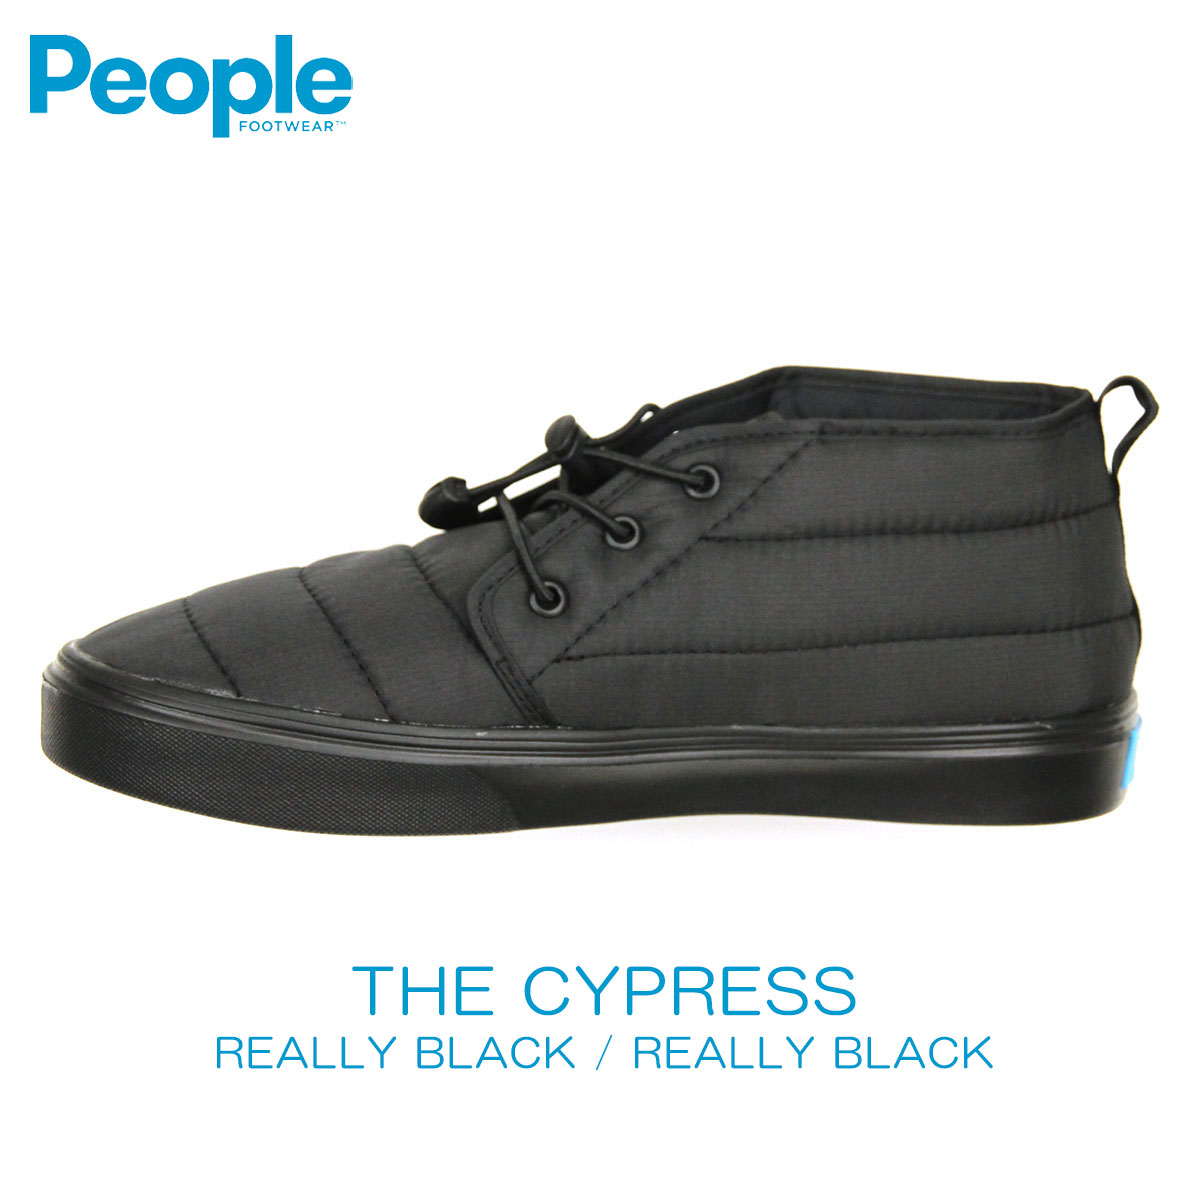 20%OFF sale people footwear People Footwear regular store men shoes shoes  THE CYPRESS NC08-001 REALLY BLACK   REALLY BLACK D00S20 a3ec2cc53